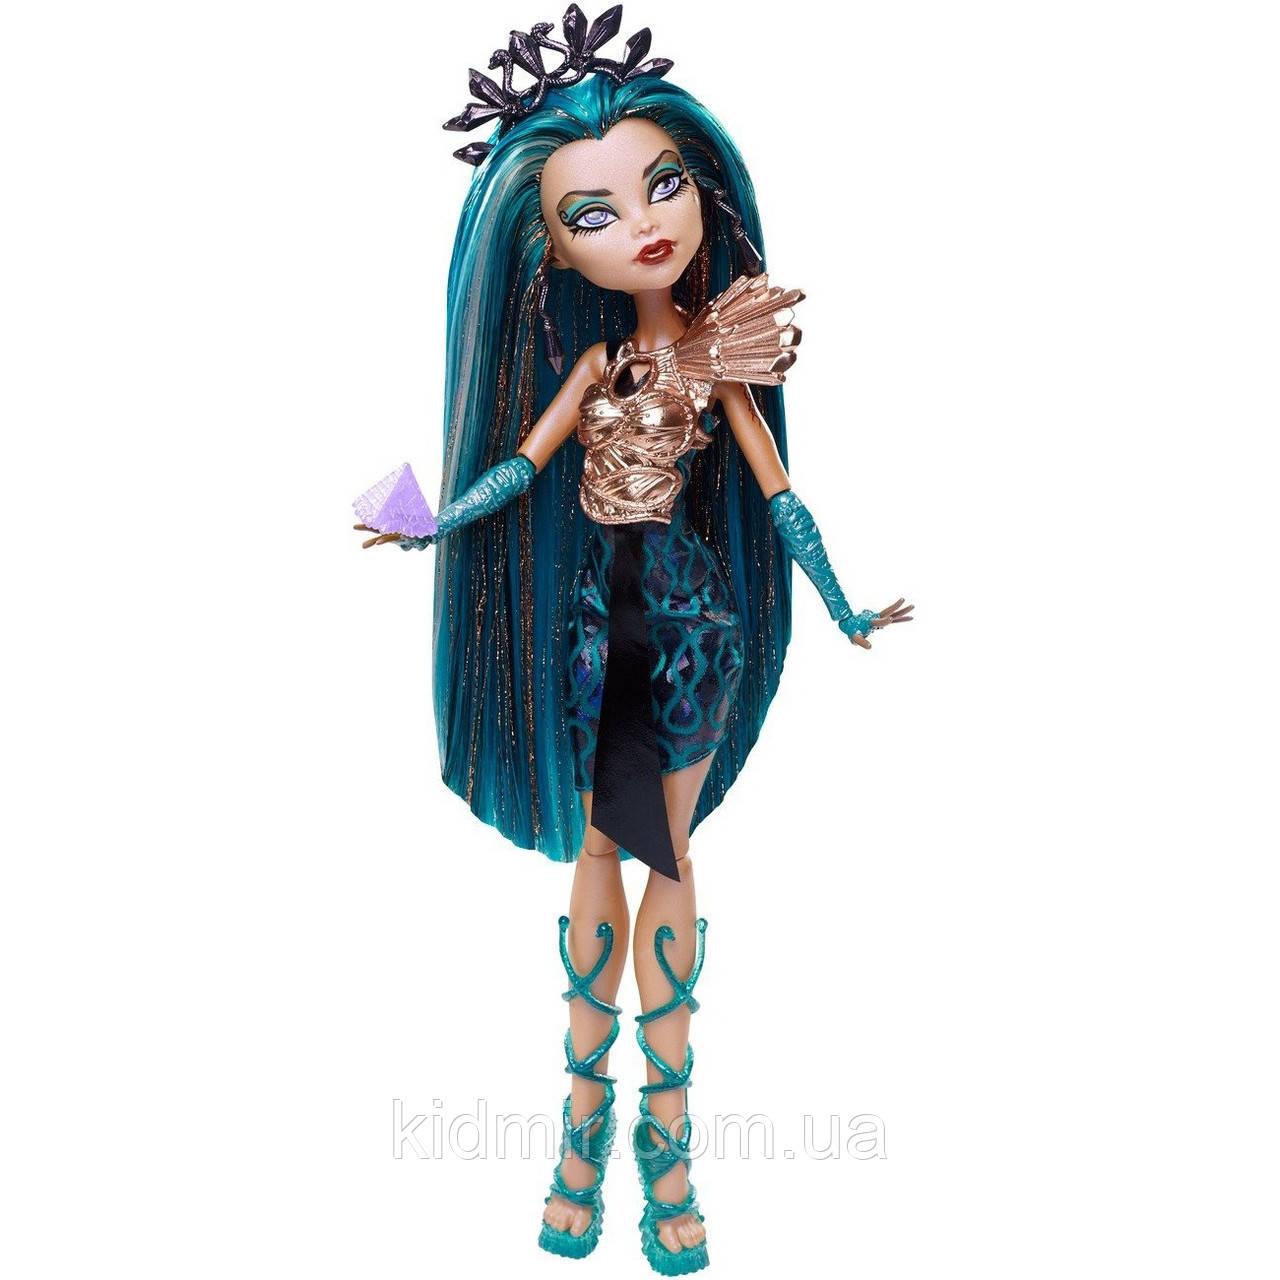 Кукла Monster High Нефера де Нил (Nefera de Nile) из серии Boo York Монстр Хай